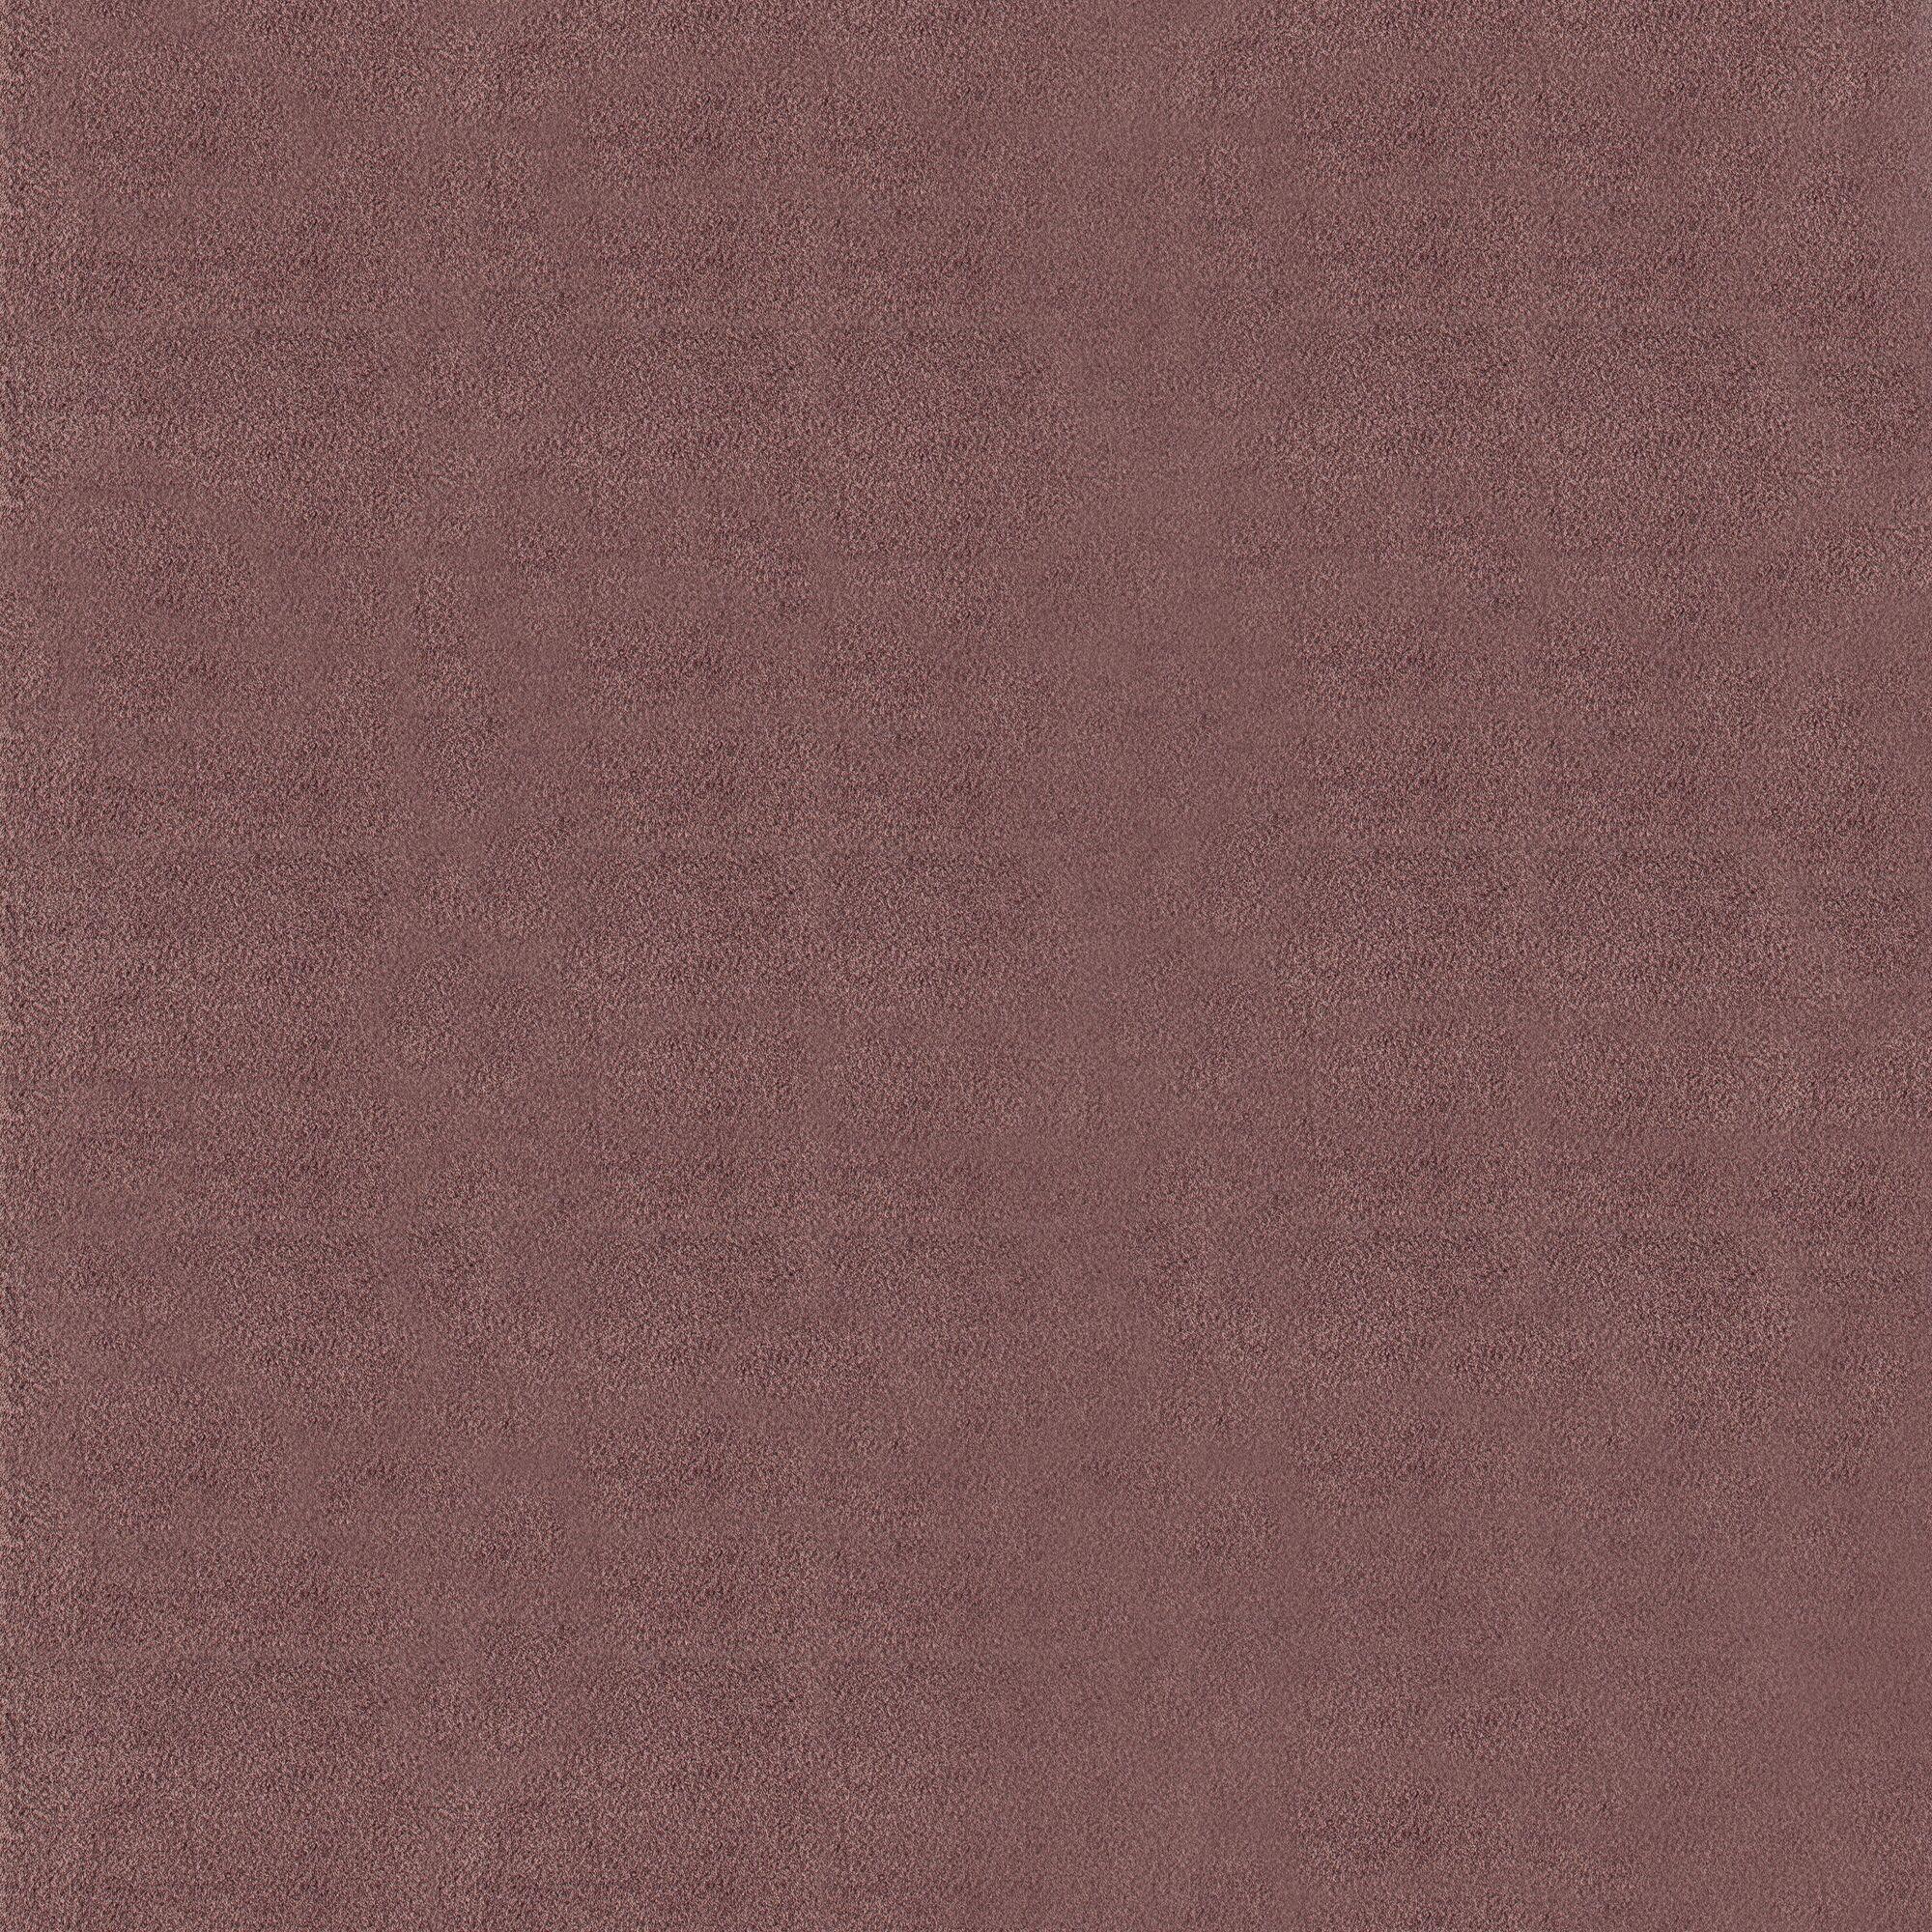 Rangel Carmine Area Rug Rug Size: Square 7' 10